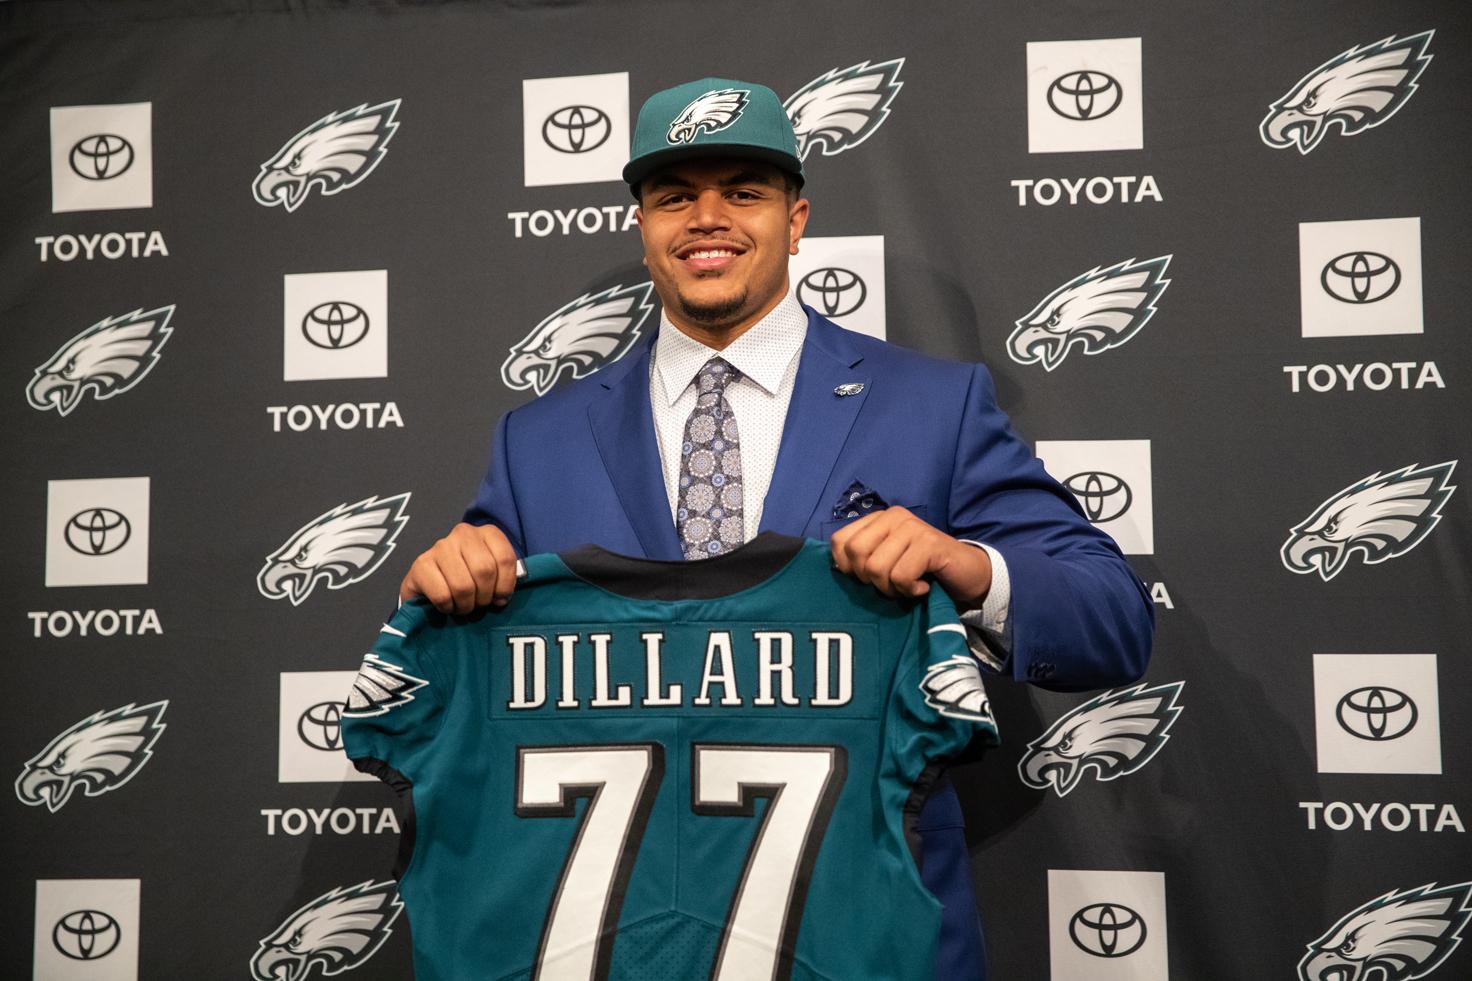 Eagles look to immediate future with Dillard pick - Northeast Times